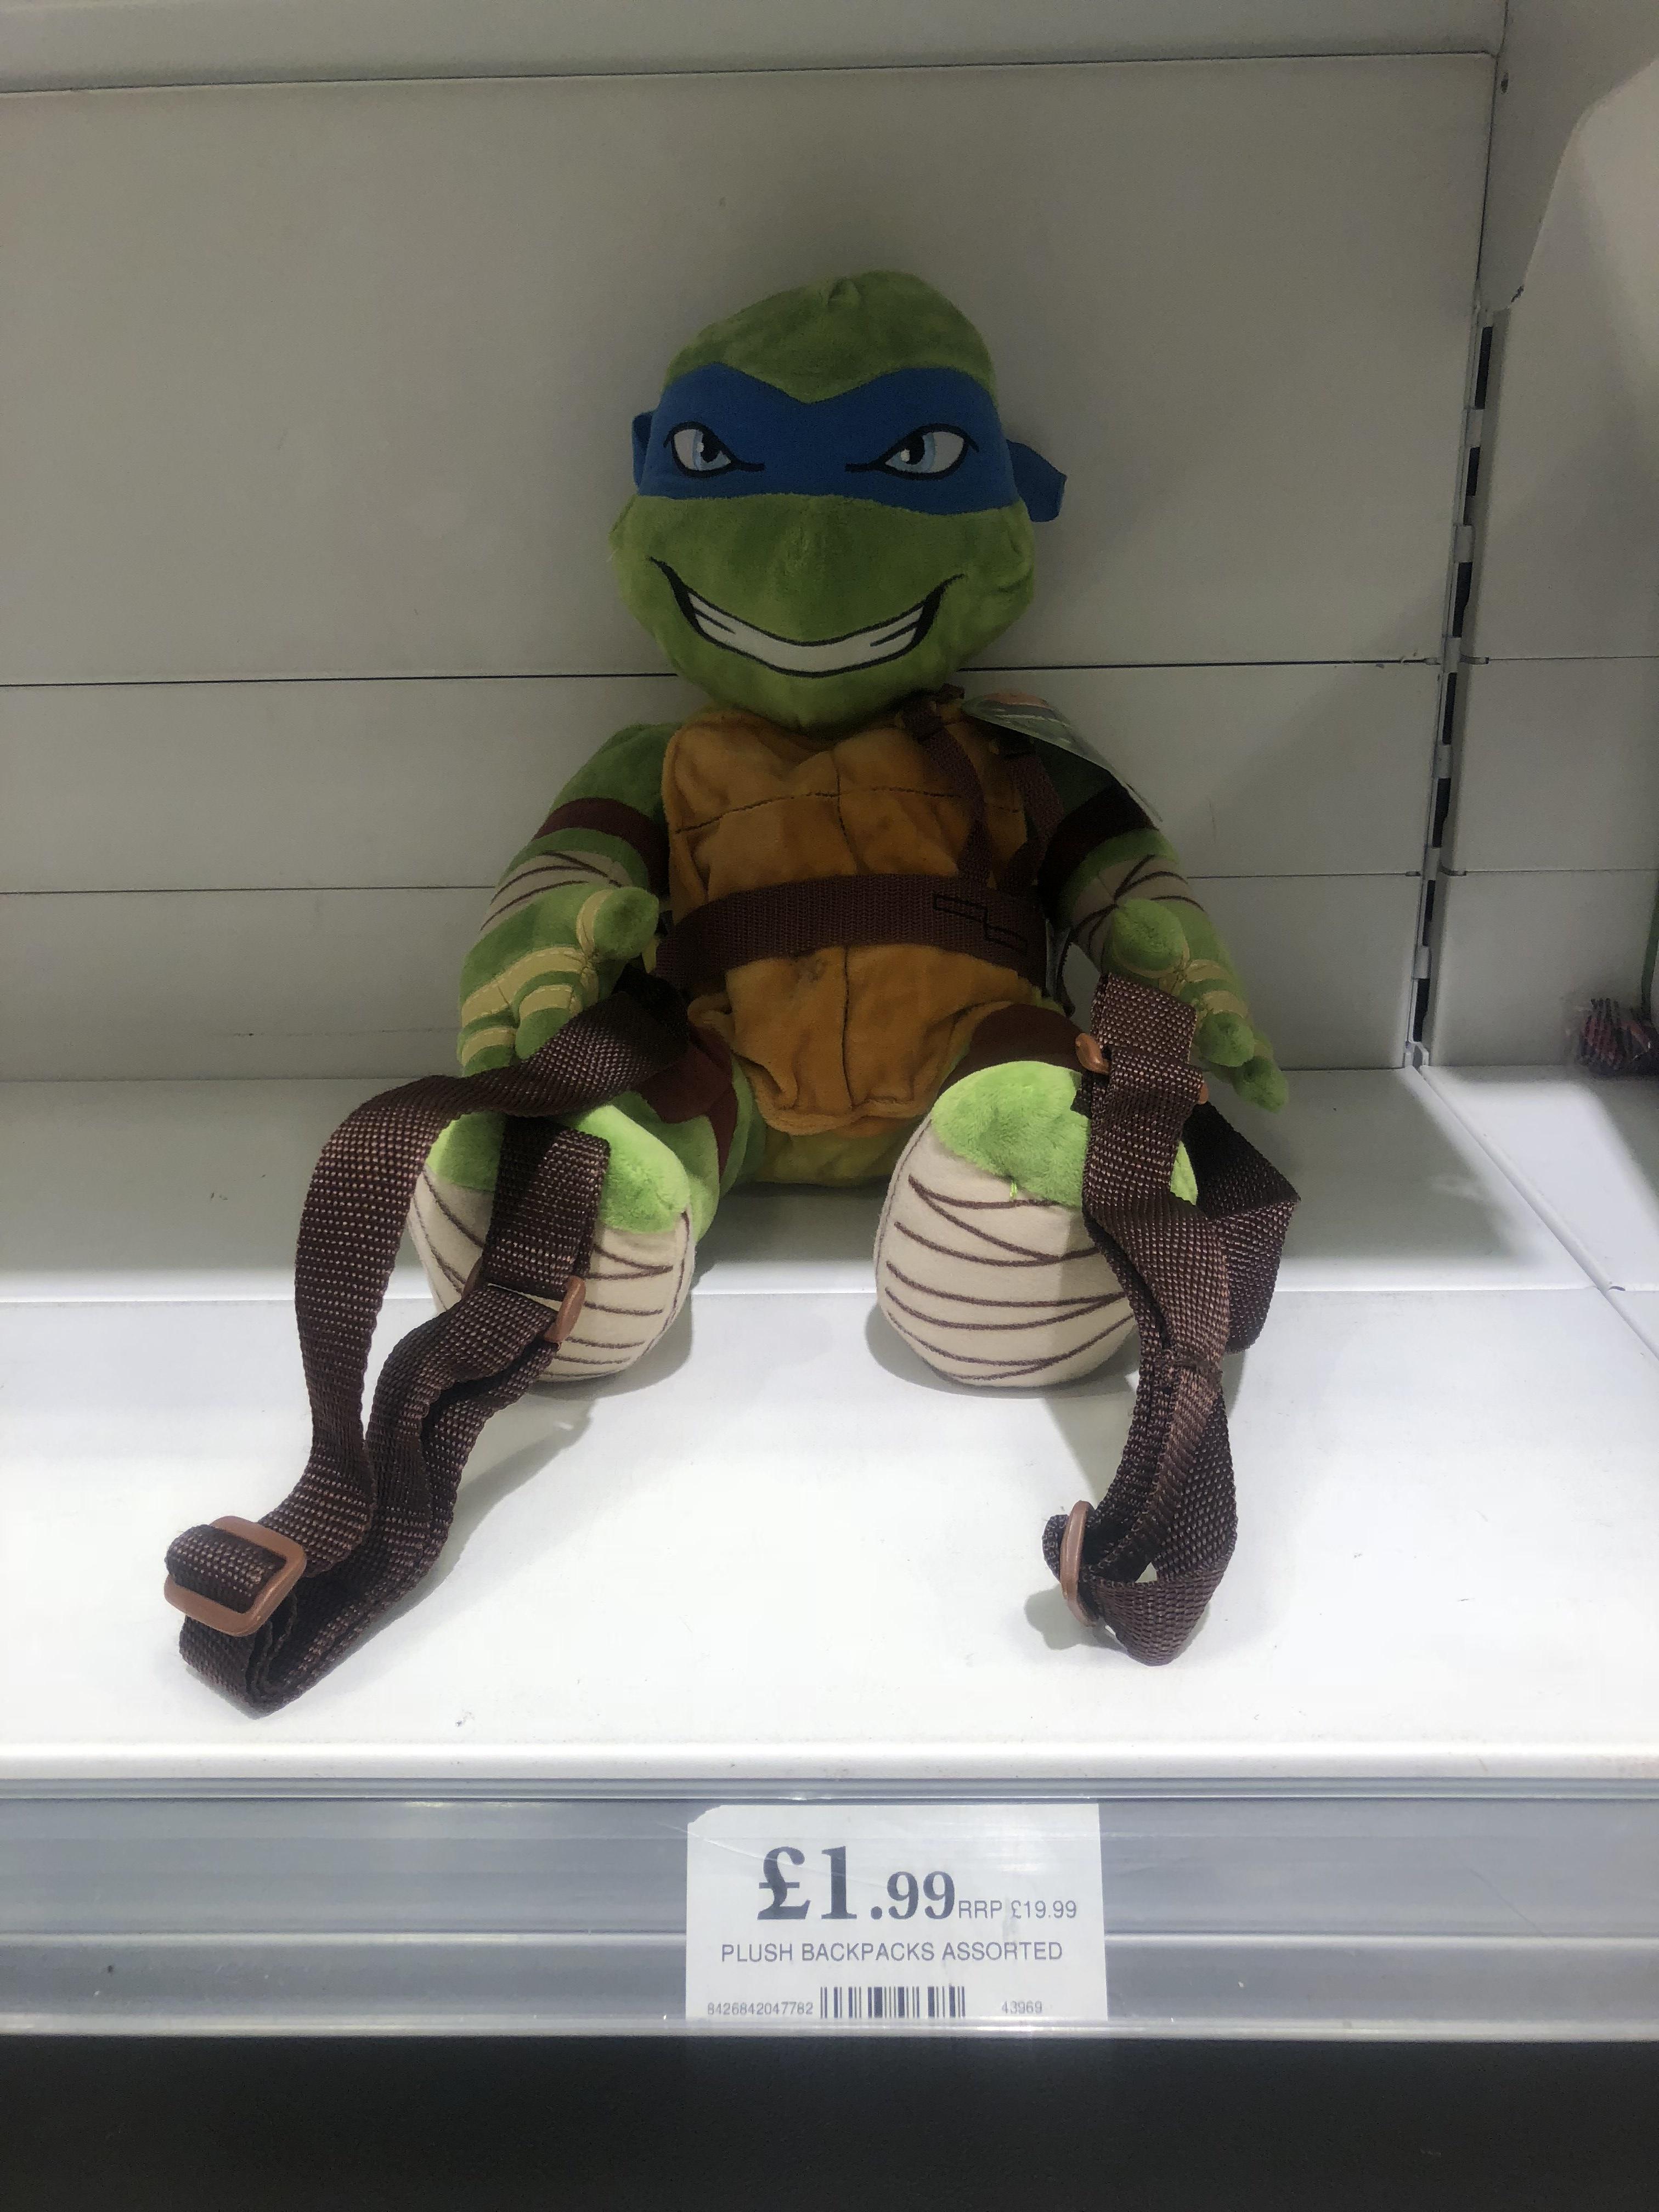 Teenage Mutant Ninja Turtles Plush Backpack only £1.99 Home Bargains